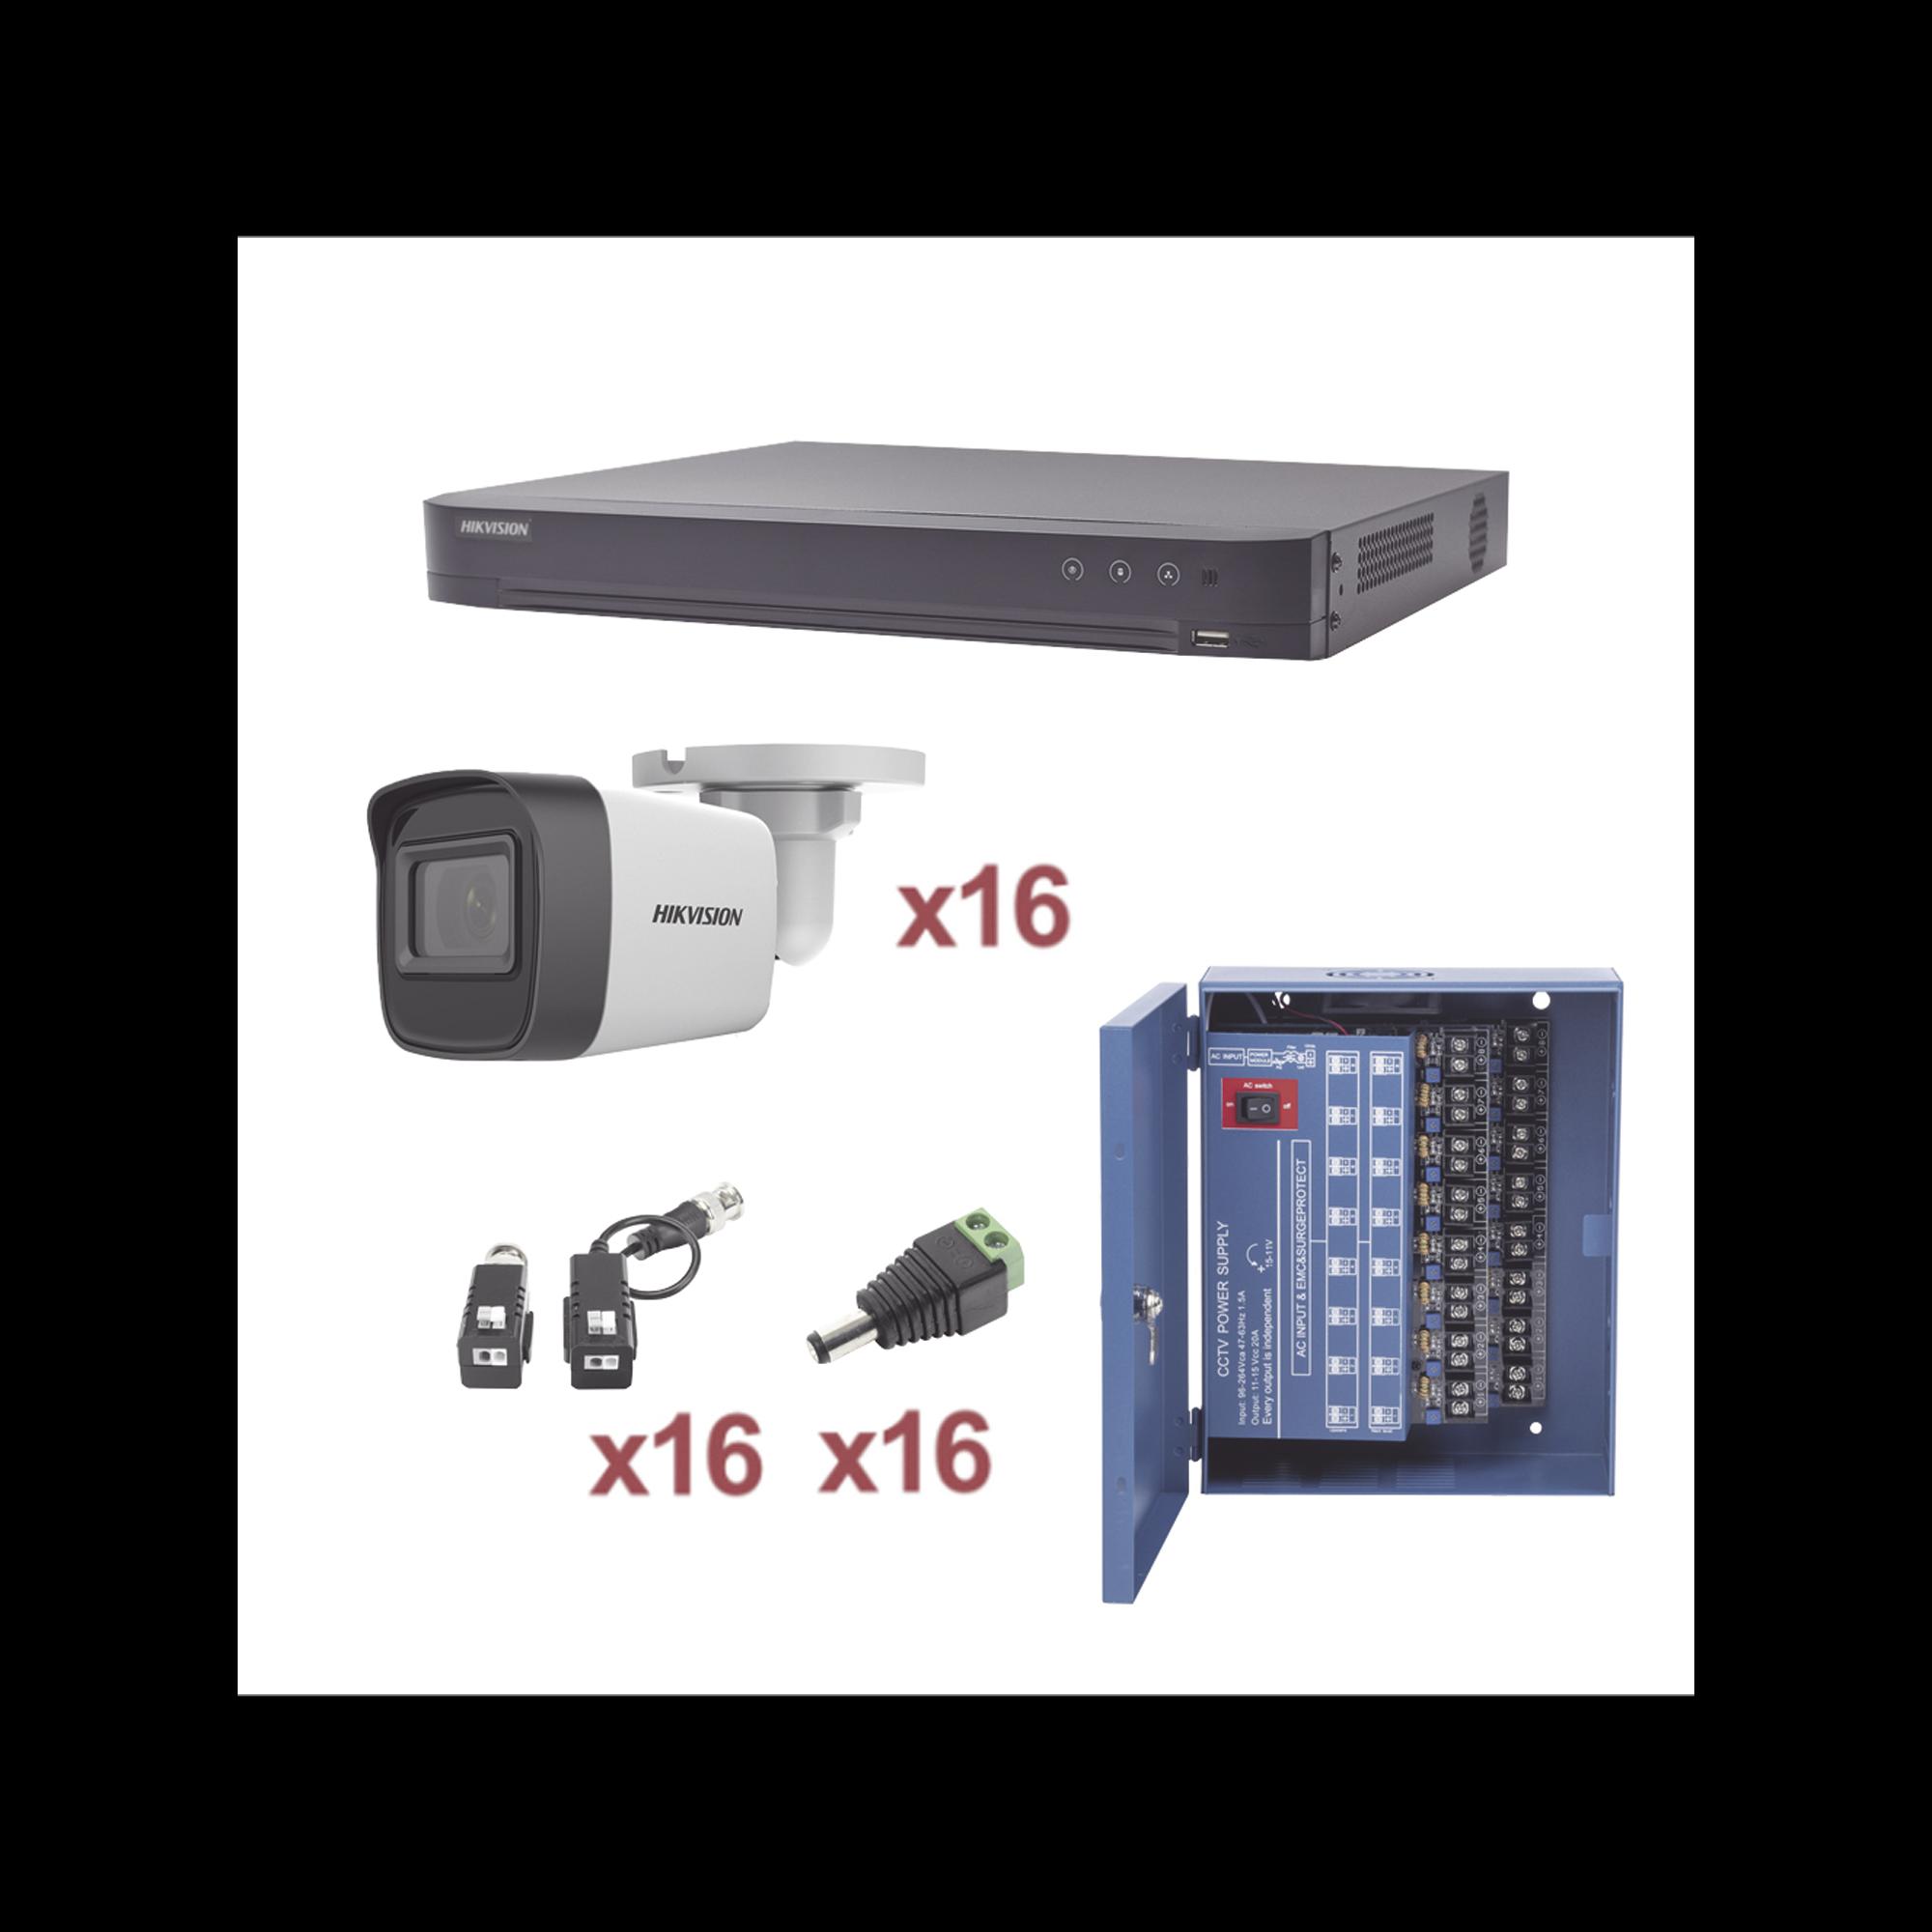 KIT TurboHD 1080p / DVR 16 Canales / 16 Cámaras Bala (exterior 2.8 mm) / Transceptores / Conectores / Fuente de Poder Profesional